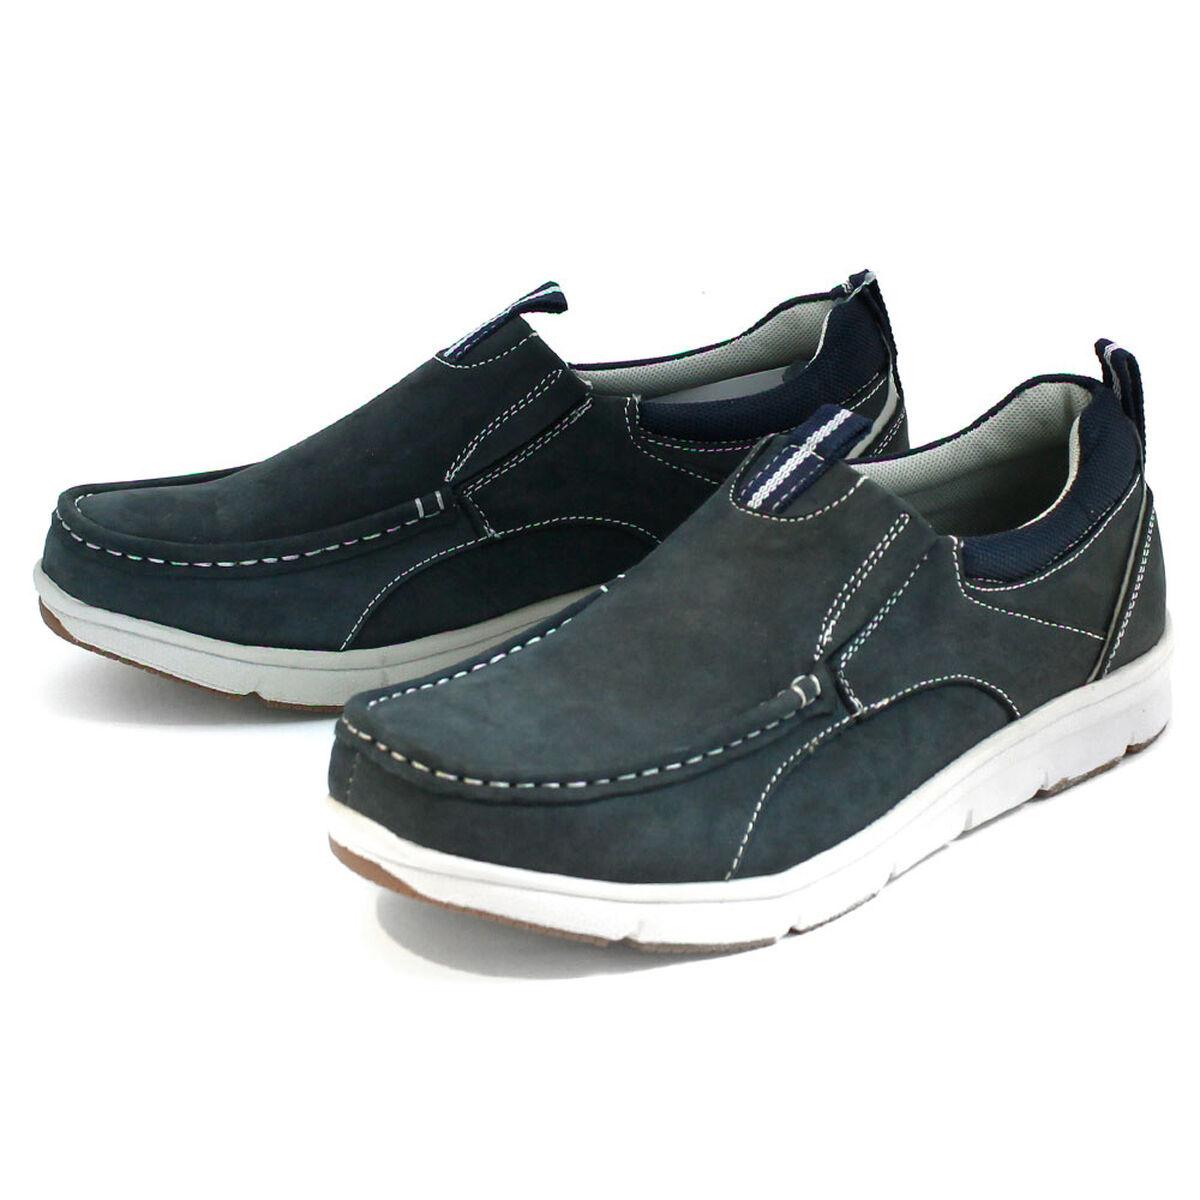 Zapato Hombre Portman Club Diego